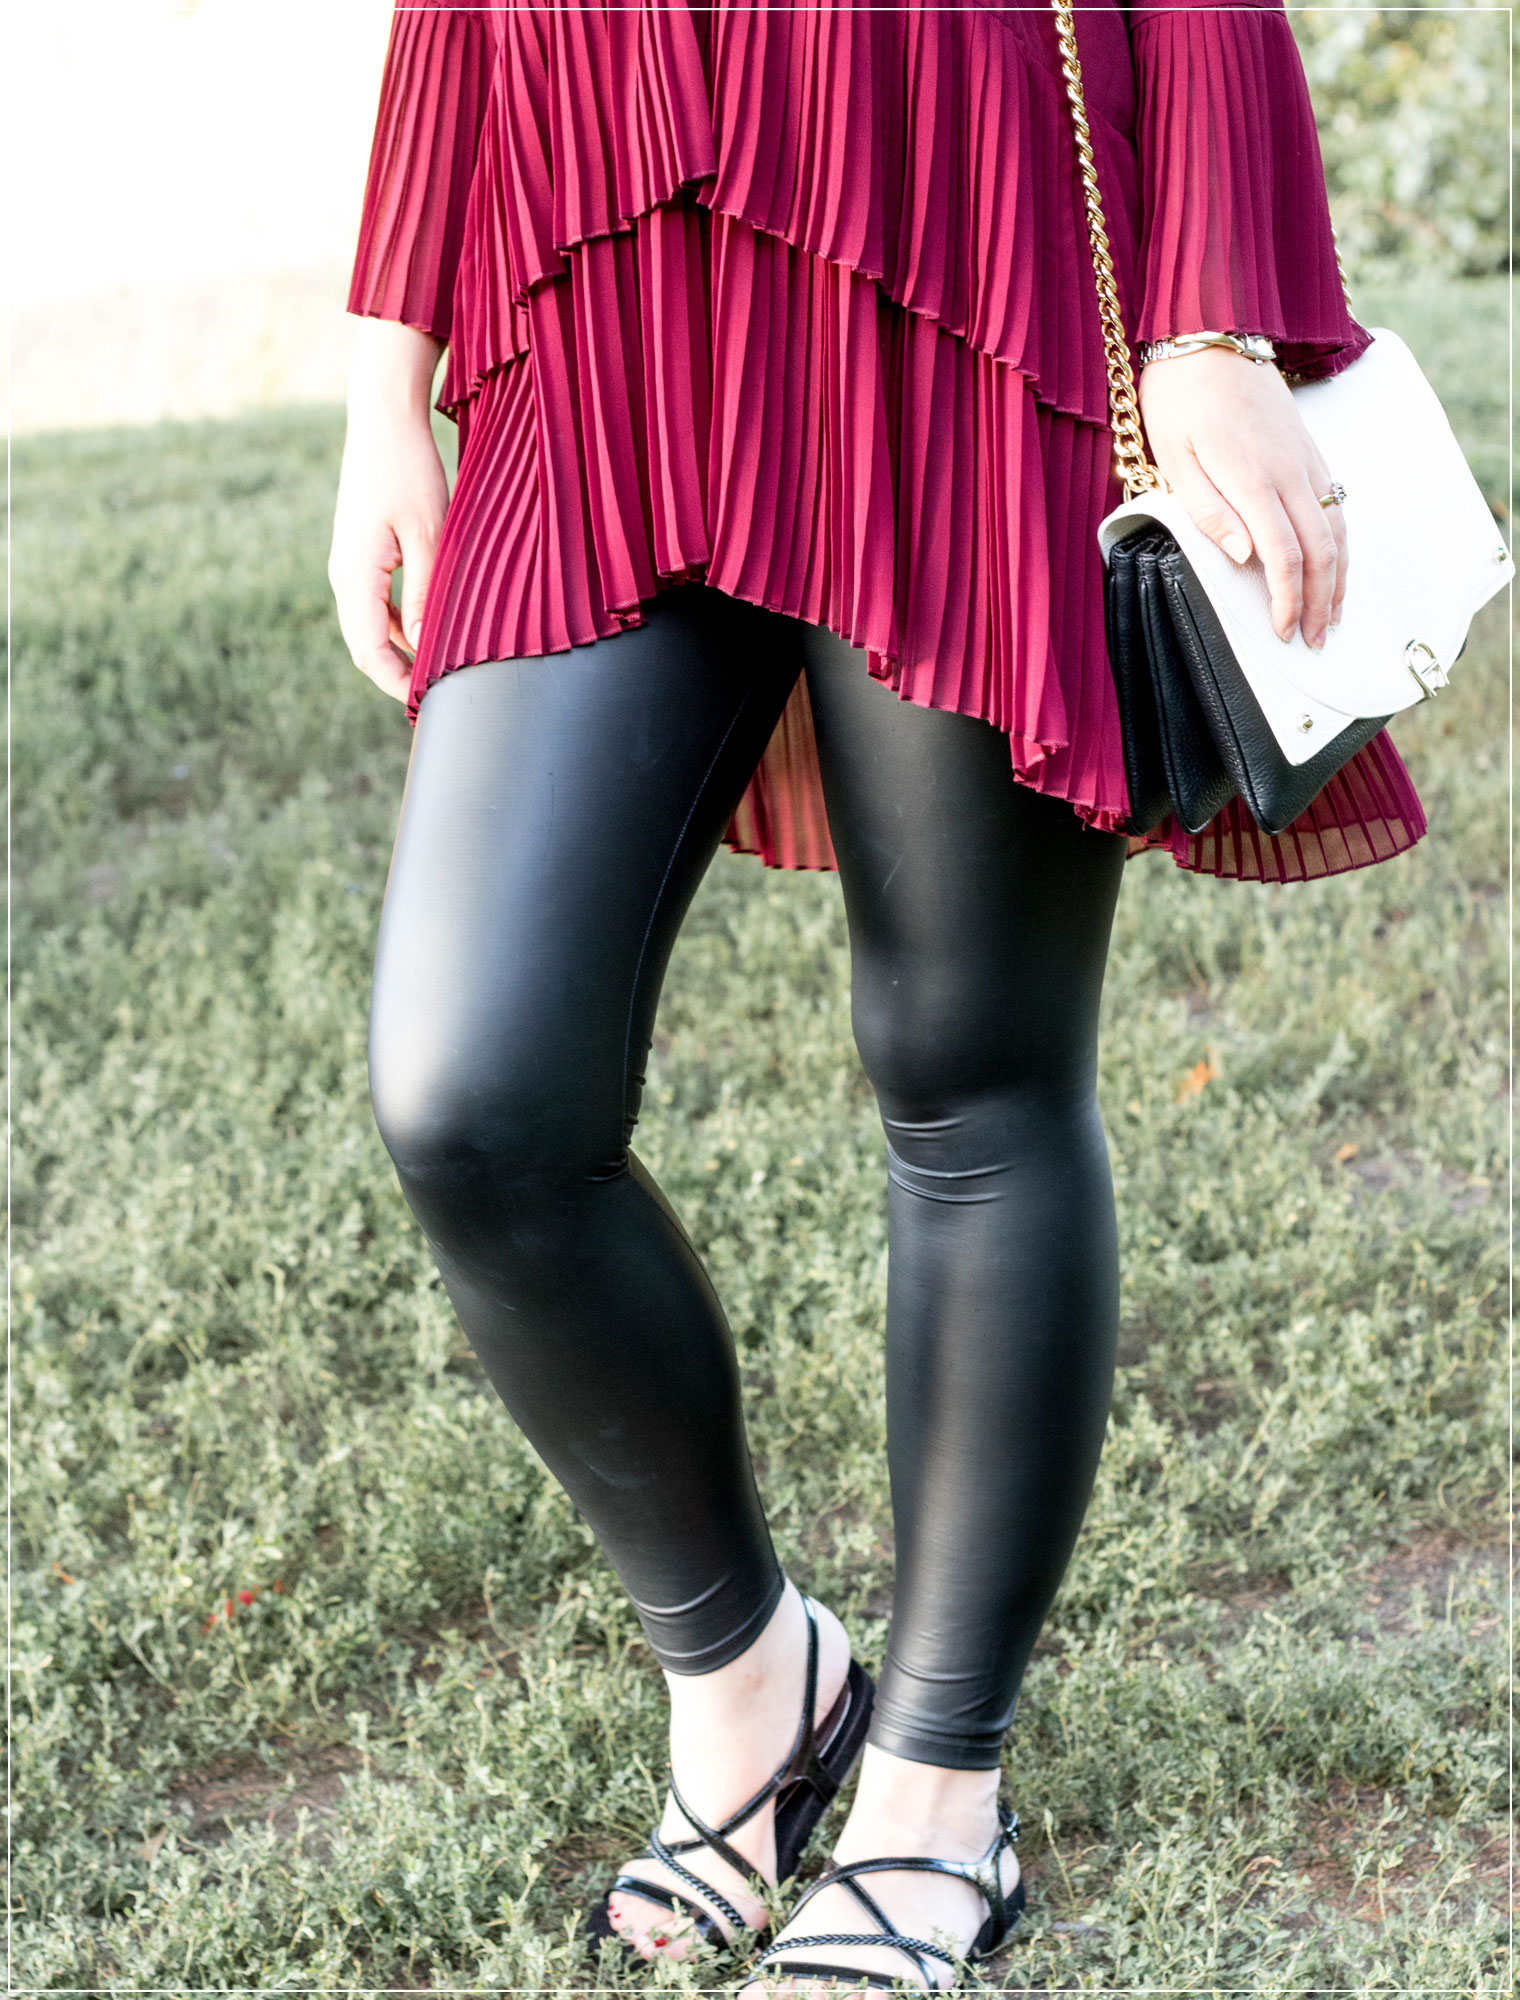 Leggings kombinieren, Leggings, Leder, Volants, Herbstoutfit, Herbstlook, Leipzig, Outfitinspiration, Autumnstyle, Abendoutfit, Modebloggerin, Fashionbloggerin, Modeblog, Ruhrgebiet